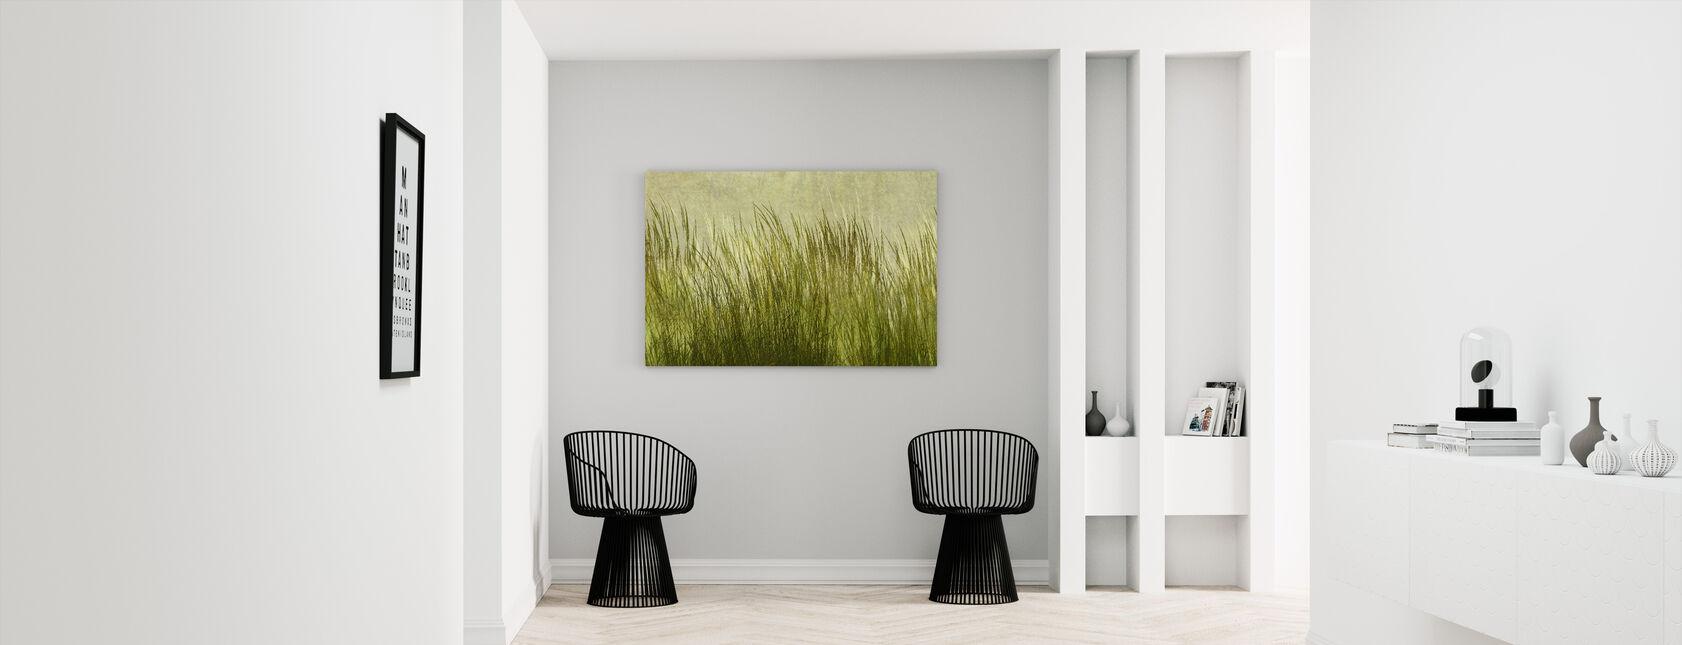 Ljusgrön Gräs Silhuett - Canvastavla - Hall